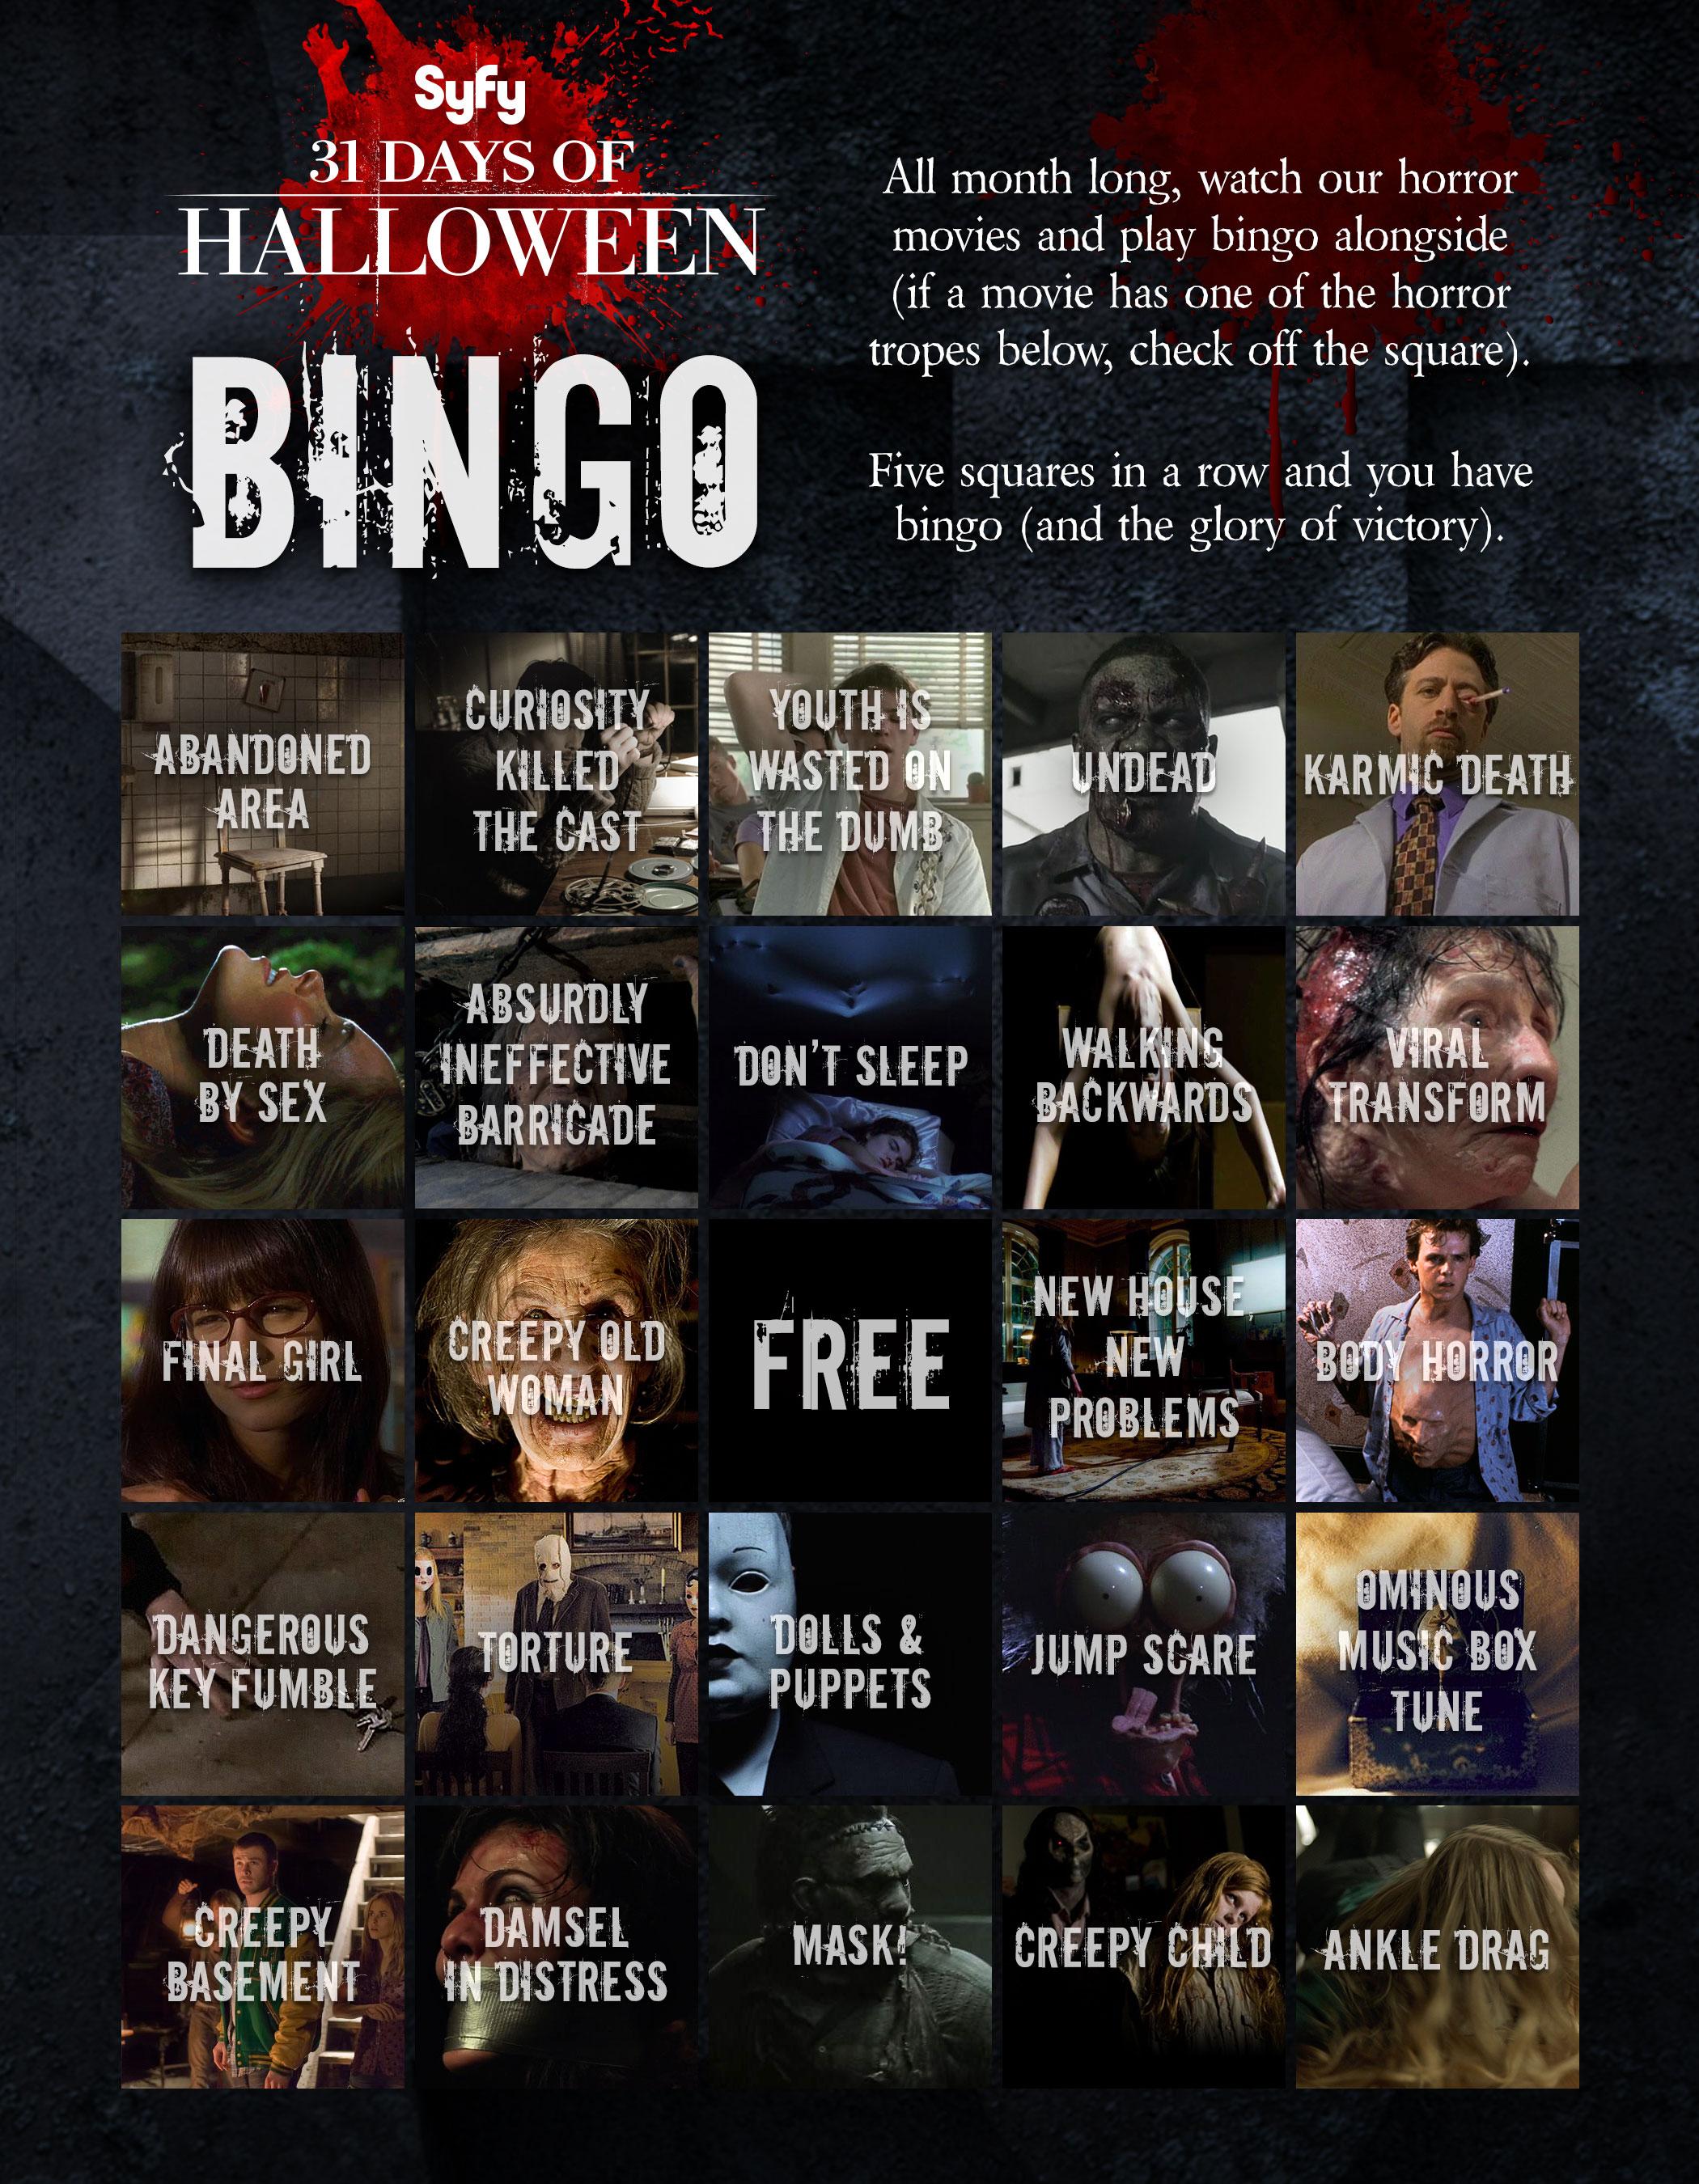 Syfy Shows 2020 31 Days Of Halloween 31 Nights of Bingo – 31 Days of Halloween News | SYFY